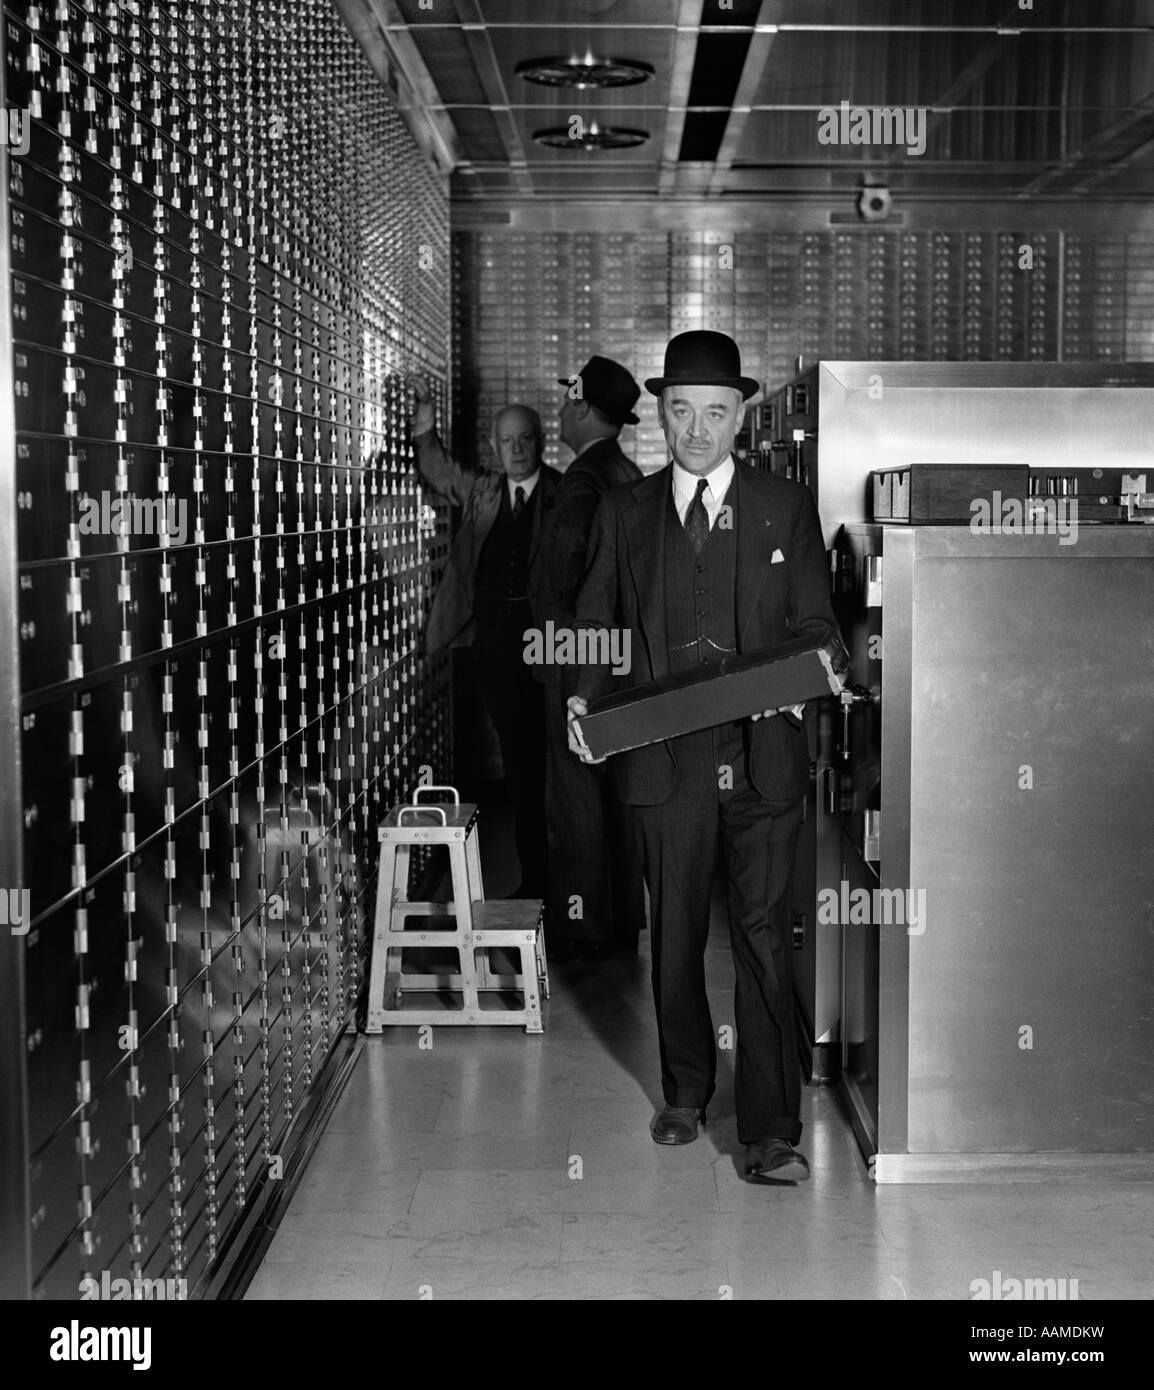 MEN MAN CARRY CARRYING SAFETY DEPOSIT BOX WEAR HAT SUIT VAULT 1930s INSPECT BANK VALUABLE - Stock Image